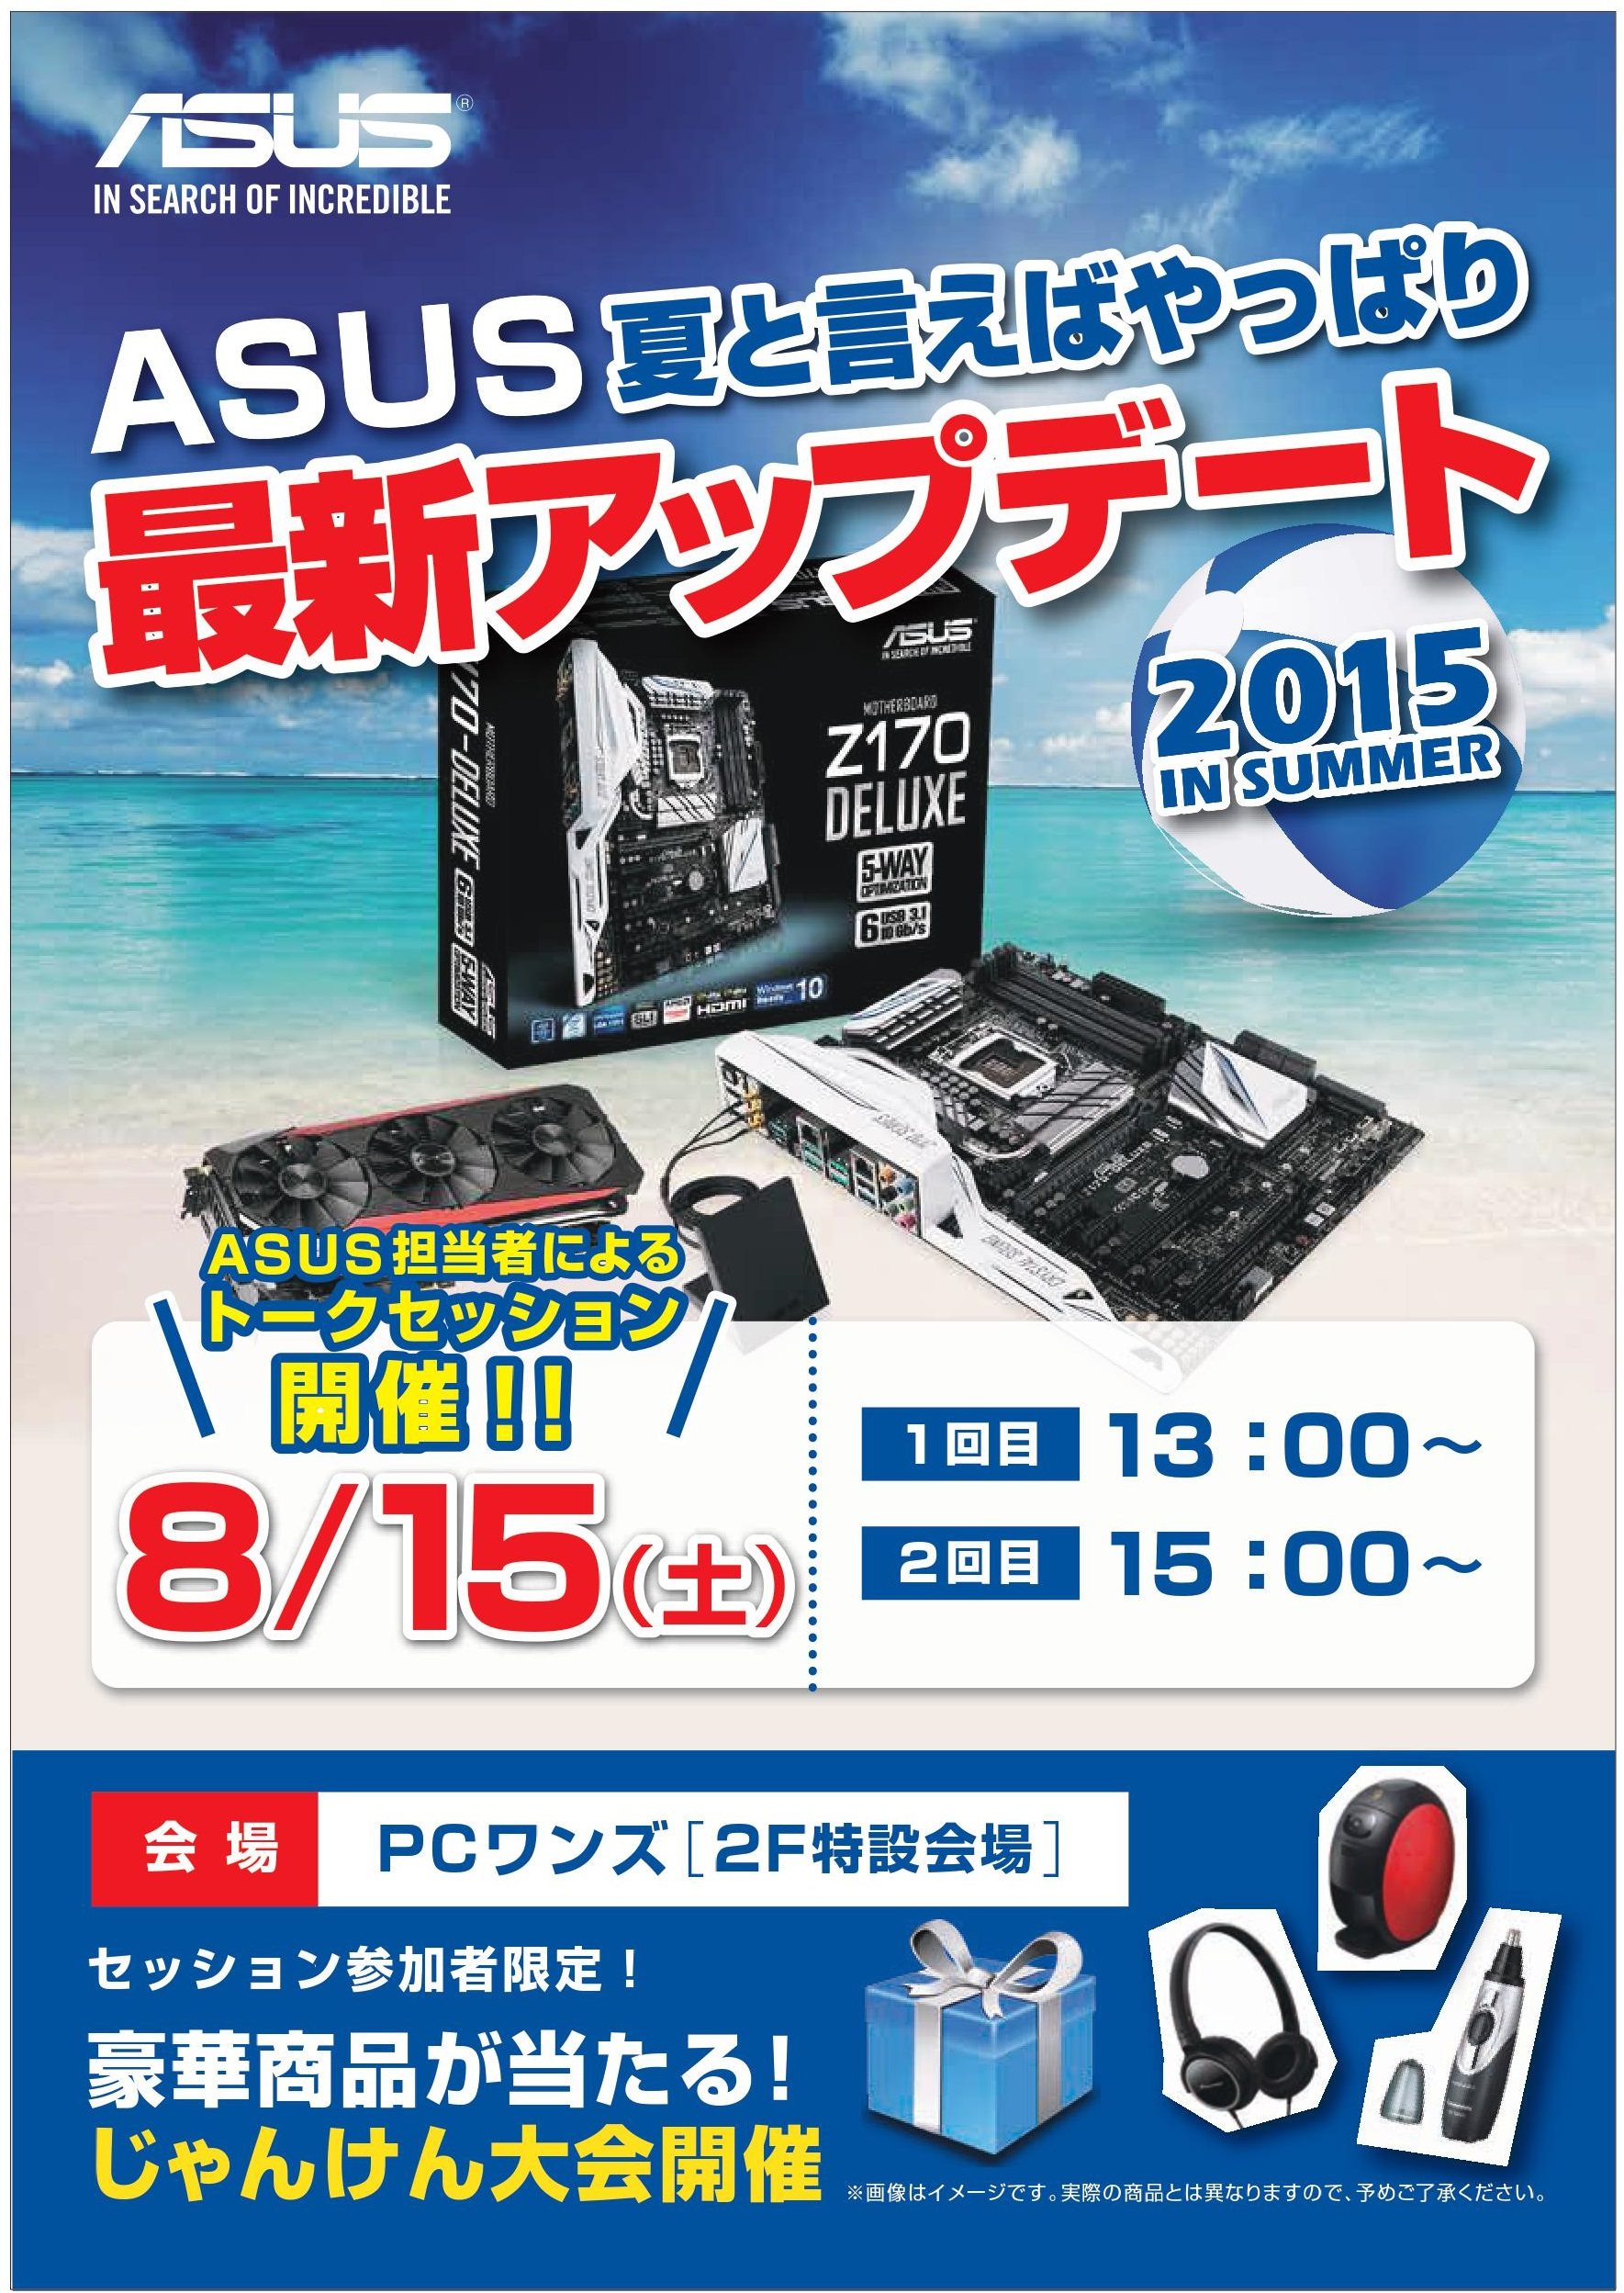 PCワンズにて「夏と言えばやっぱりASUS最新アップデート 2015 in Summer」を2015年8月15日(土)に開催!